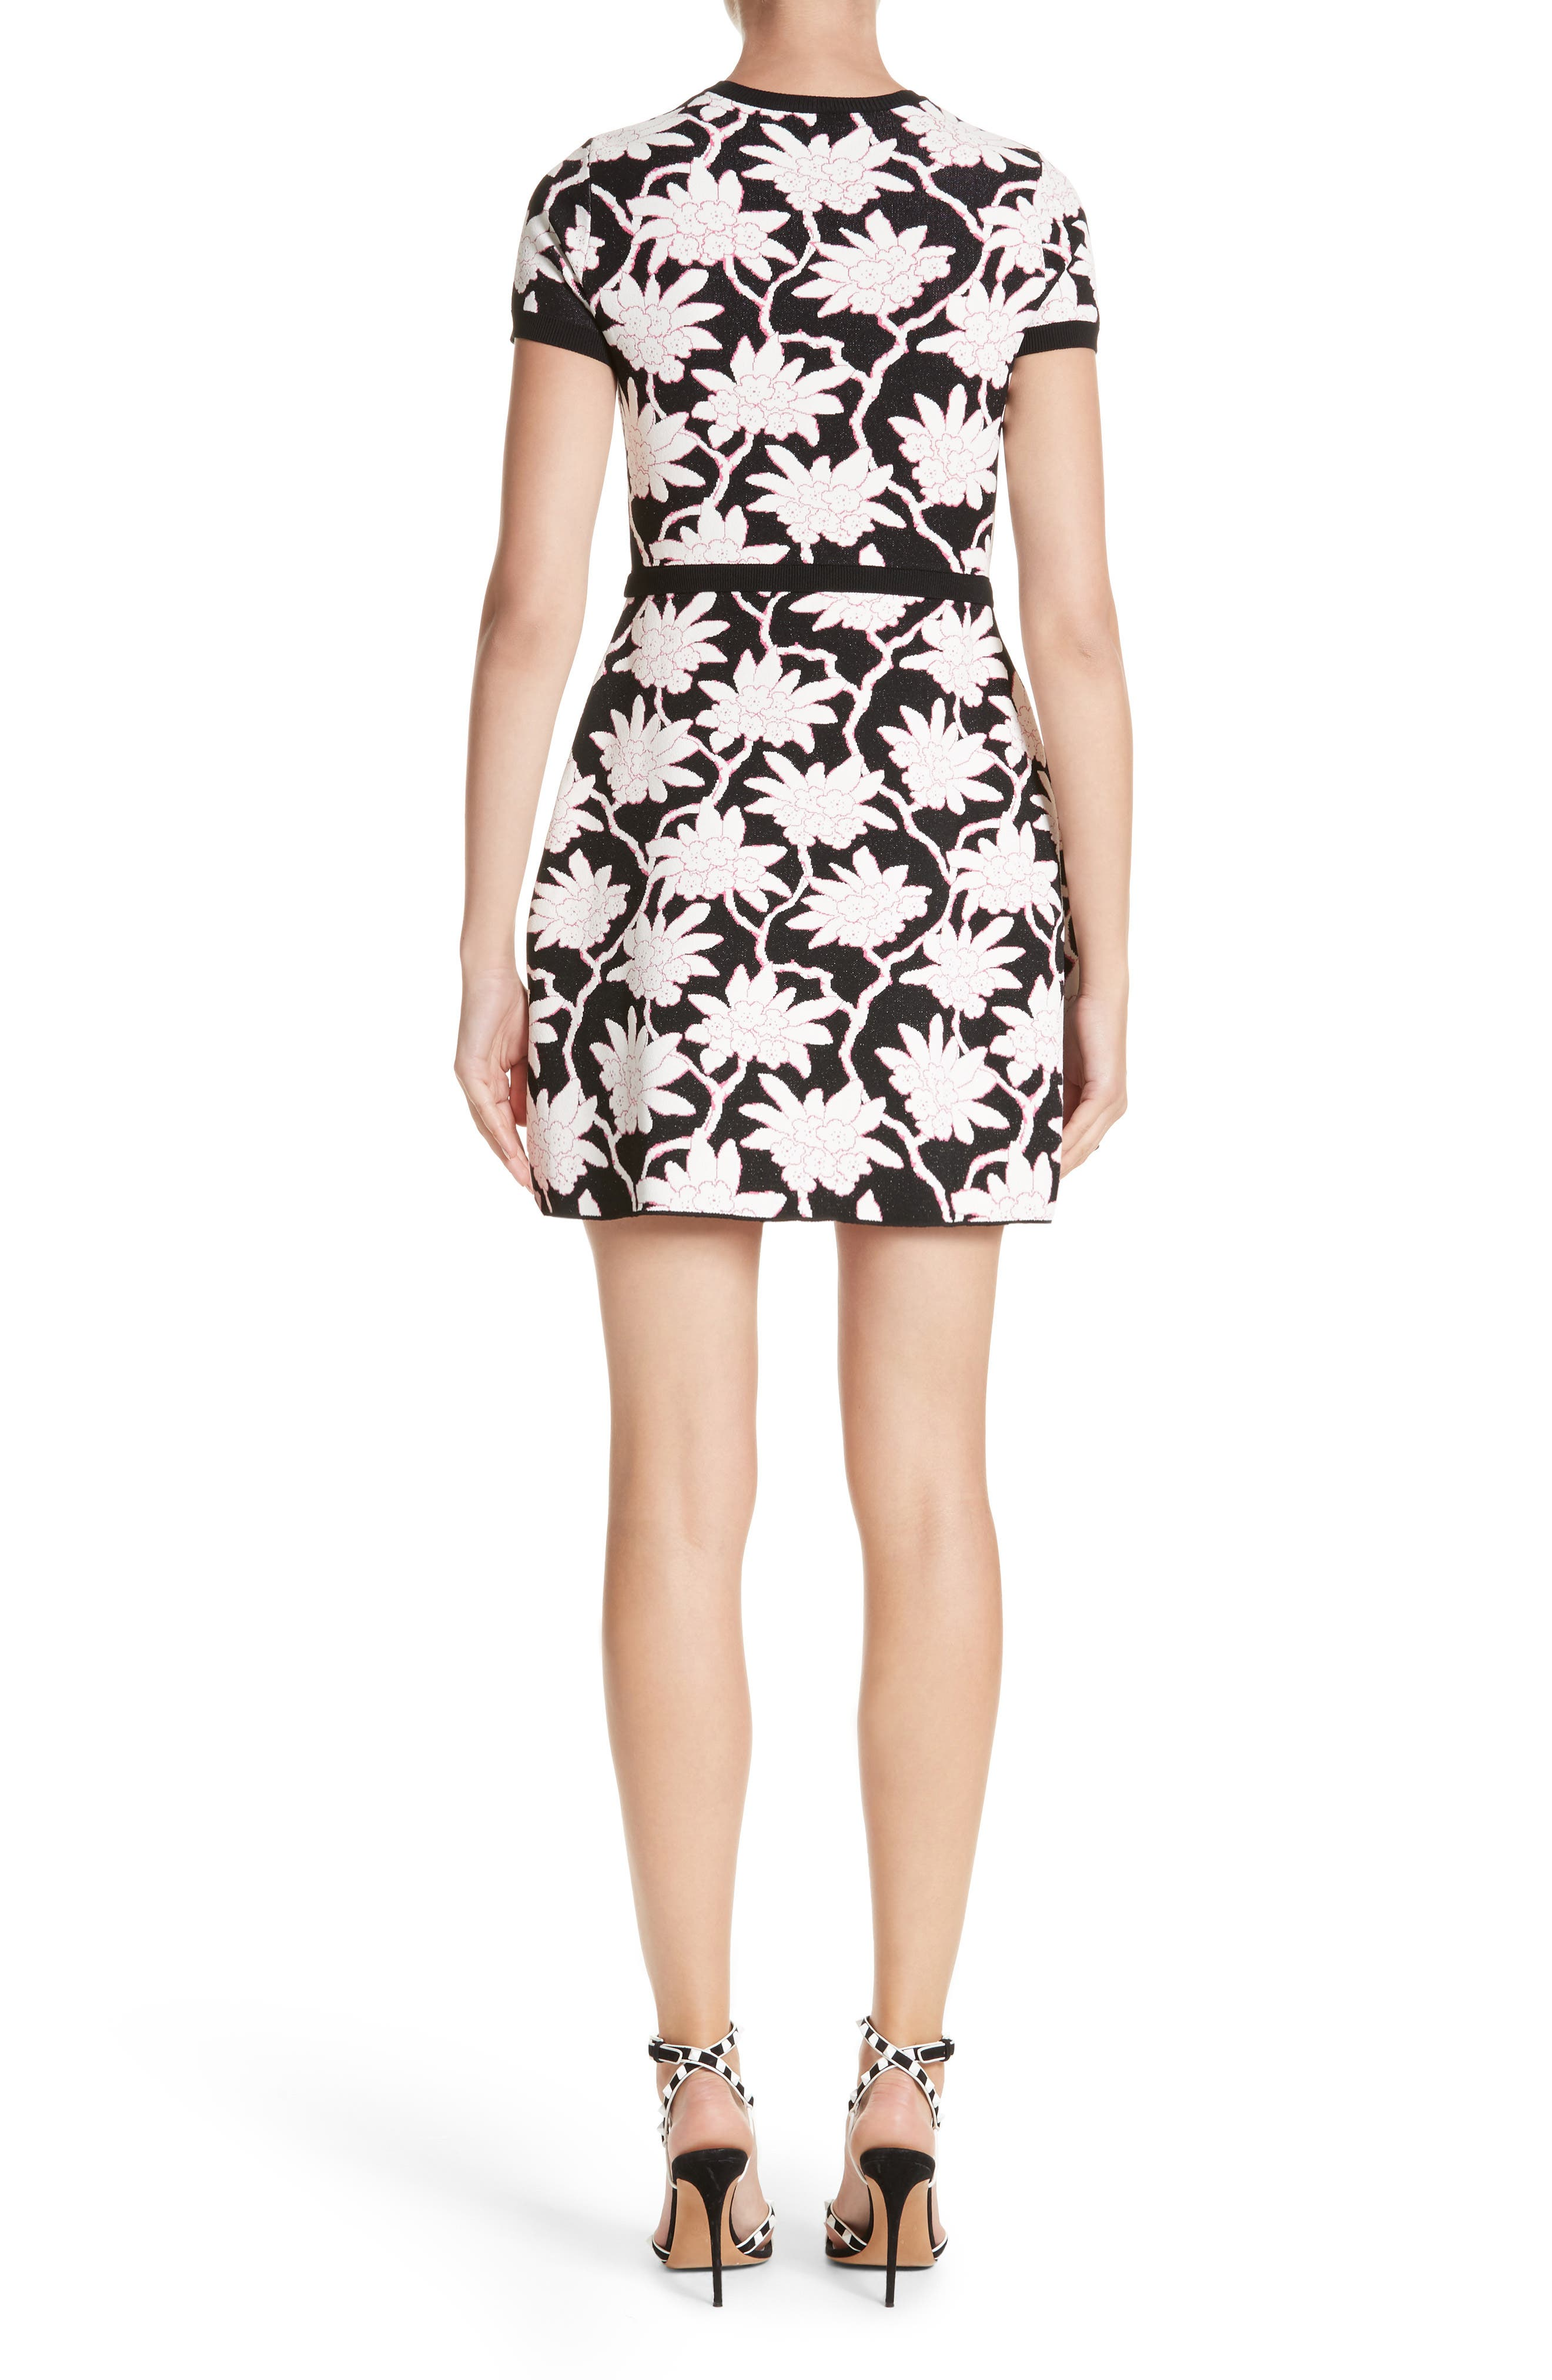 Rhododendron Jacquard Dress,                             Alternate thumbnail 2, color,                             001